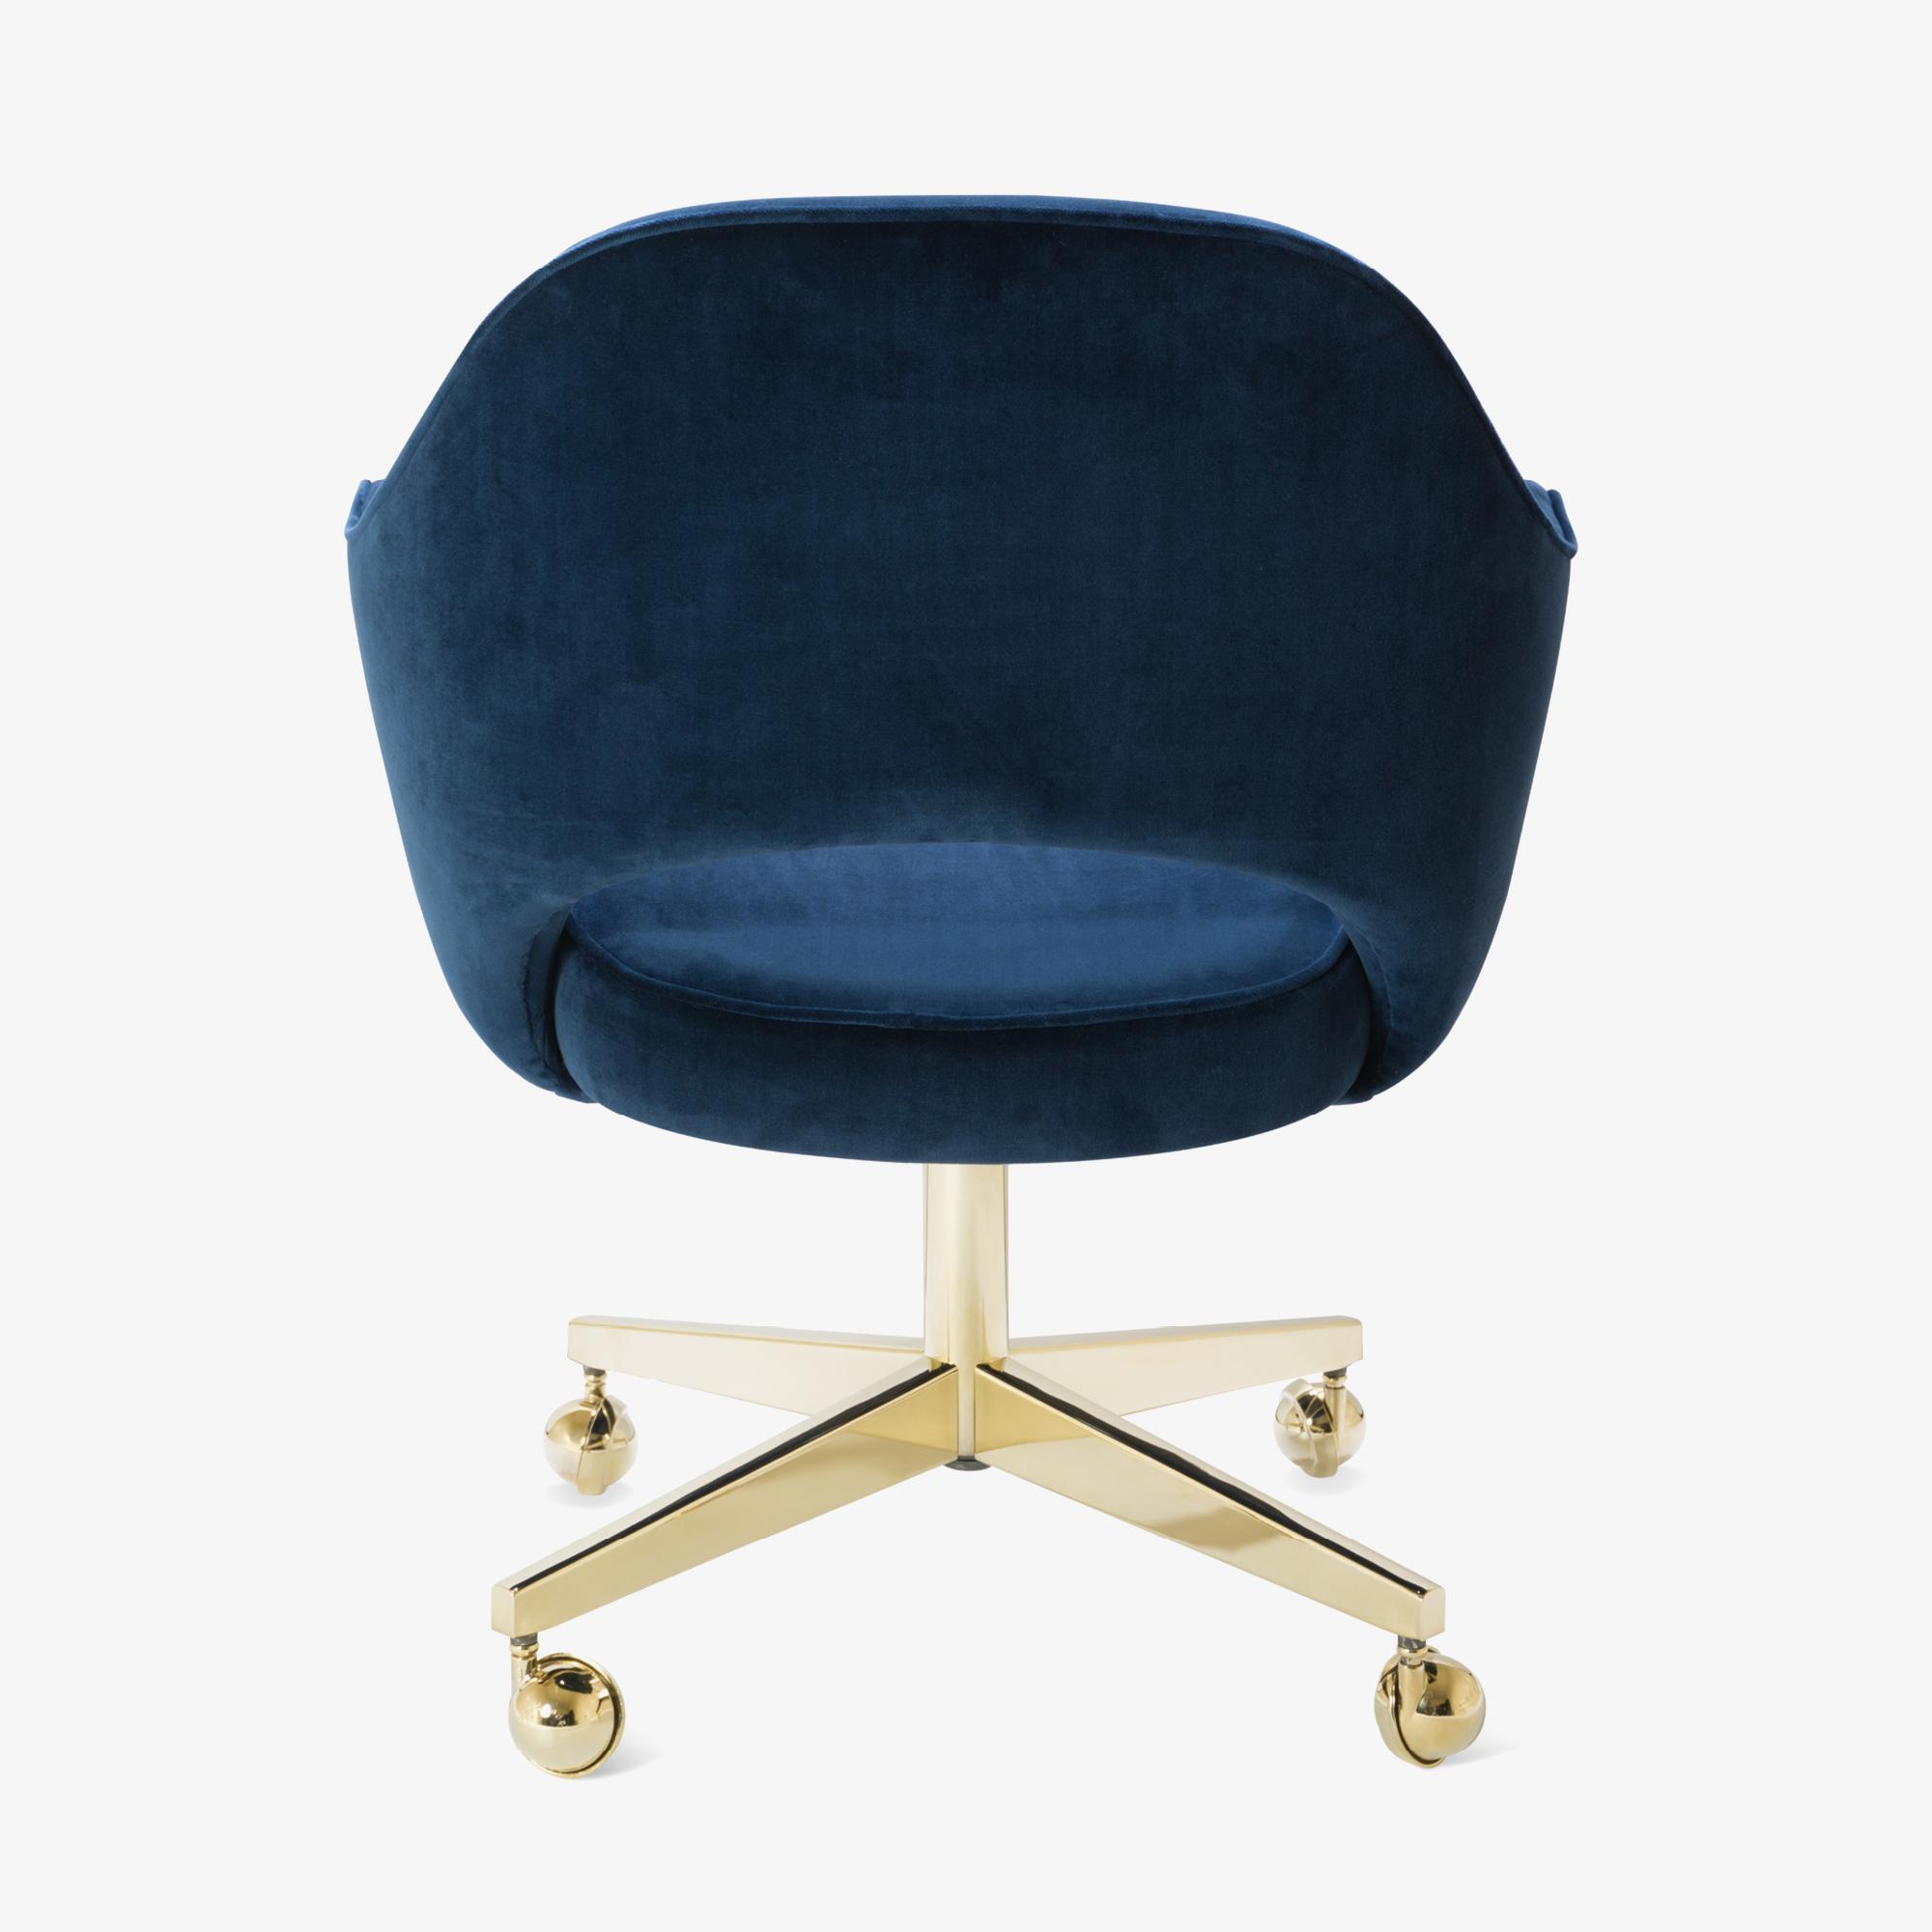 Saarinen Executive Arm Chair in Navy Velvet, Swivel Base, 24k Gold Edition6.png